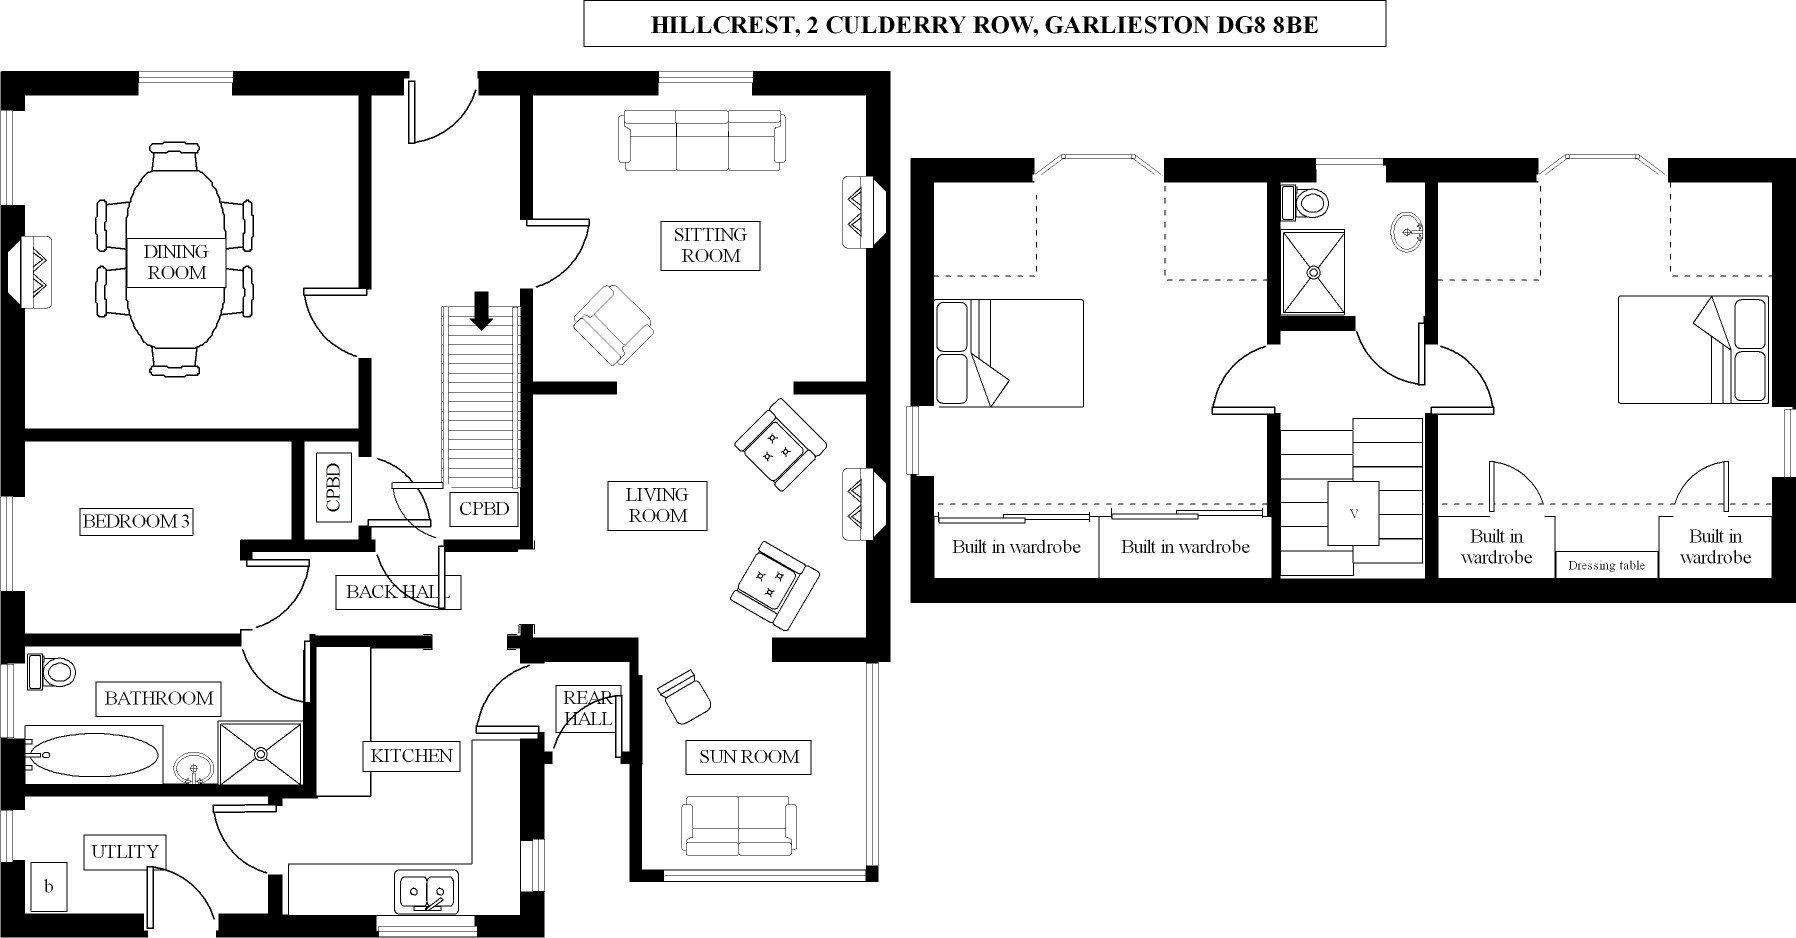 Hillcrest, 2 Culderry Row, Garlieston, DG8 8BE